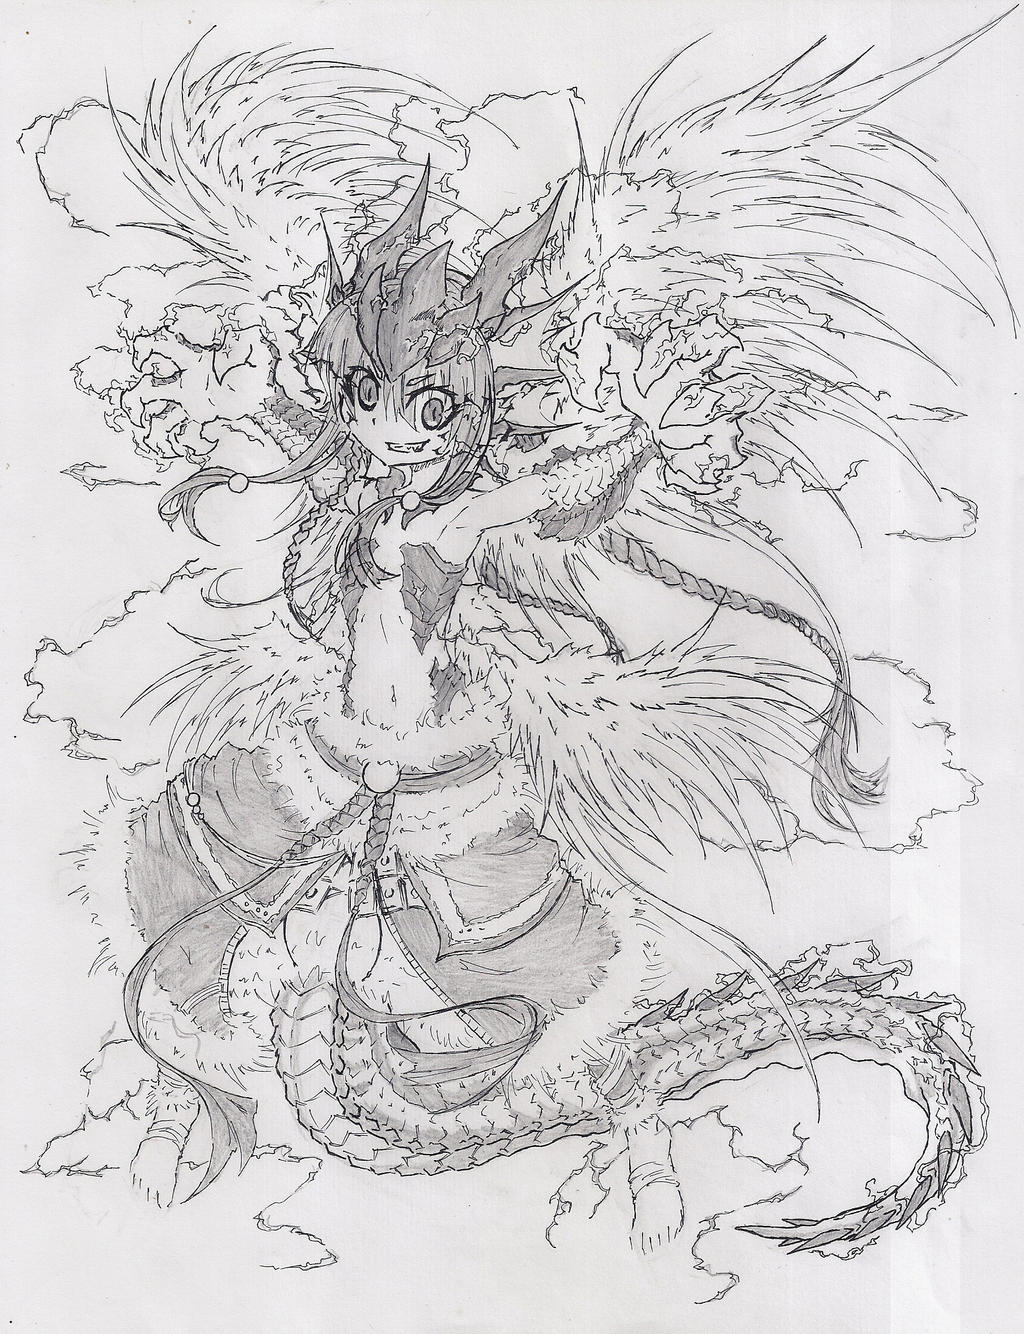 Dragonlord Kolaghan sketch by Graydrone